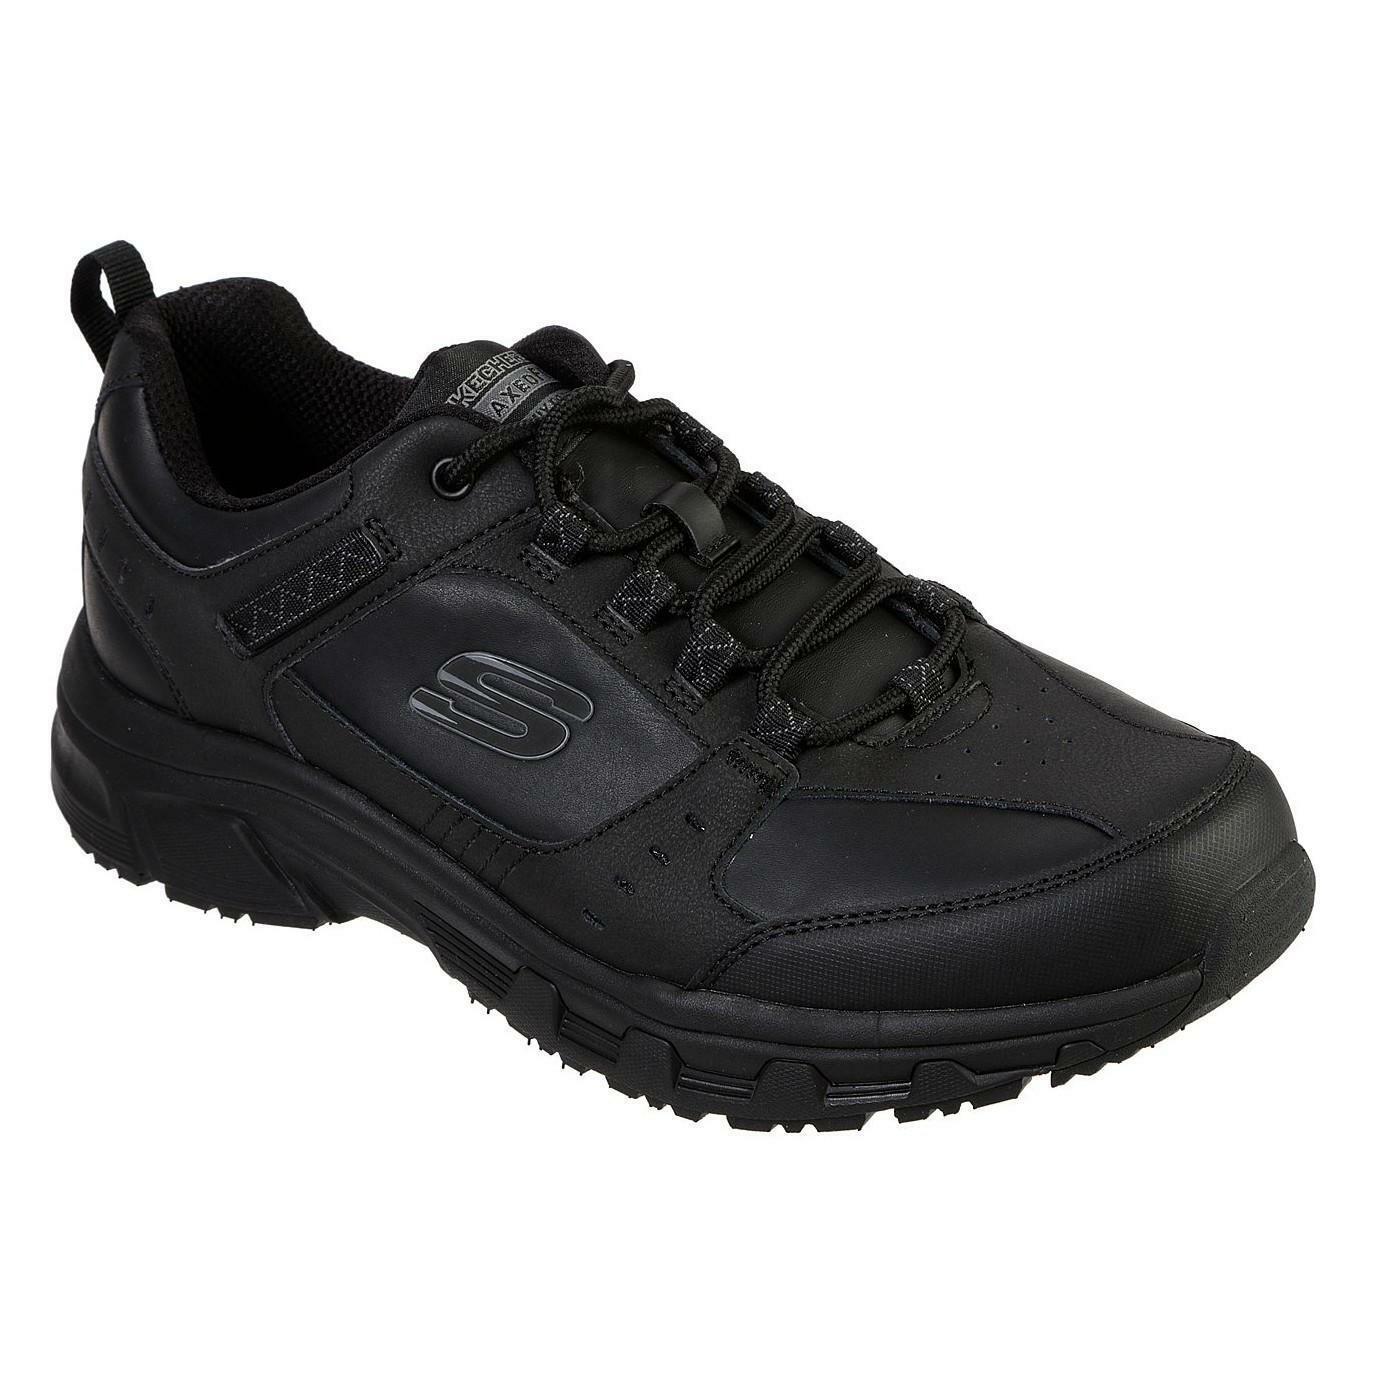 skechers skechers oak canyon-redwick, scarpe da ginnastica uomo 51896/bbk